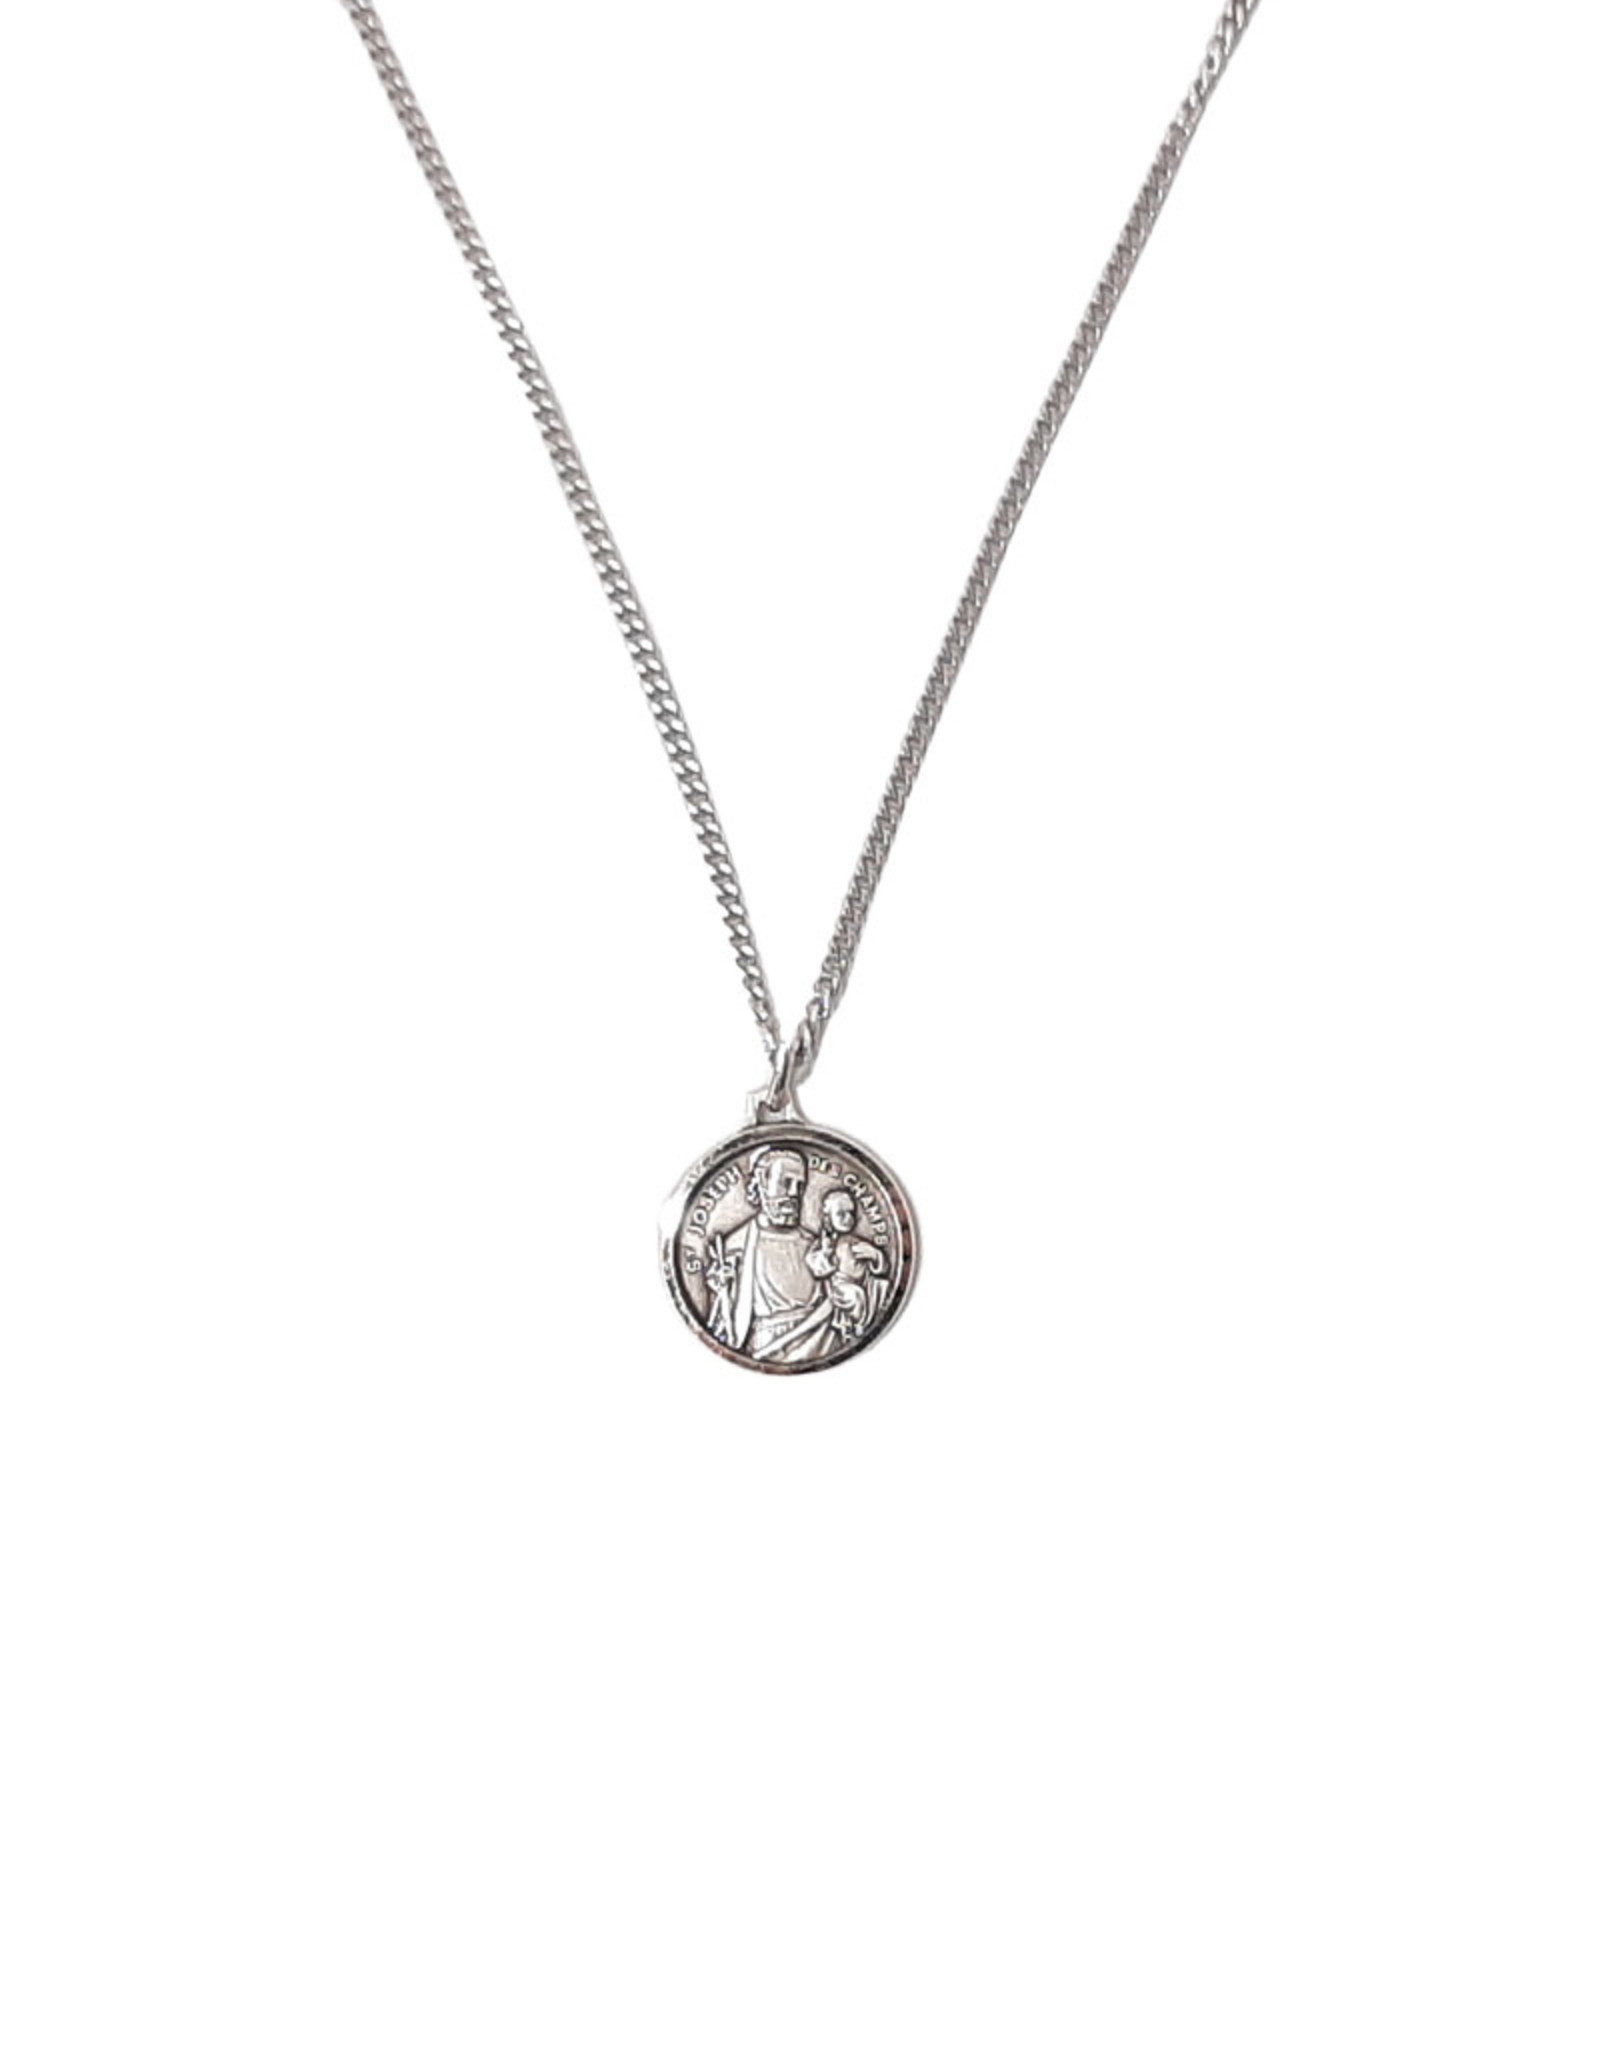 Saint Joseph medal pendant and chain